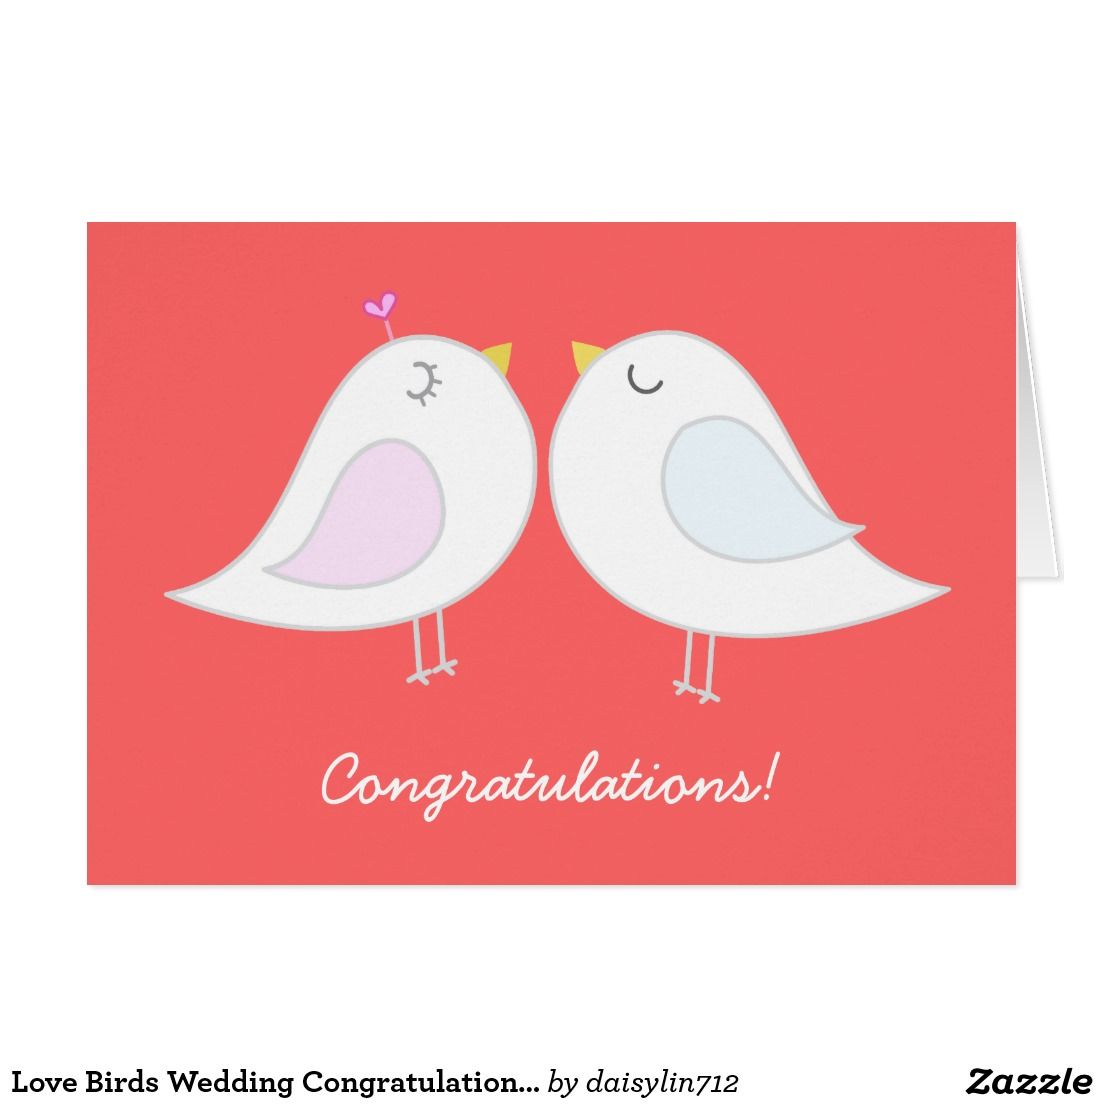 Love Birds Wedding Congratulations Card | Wedding and Engagement ...